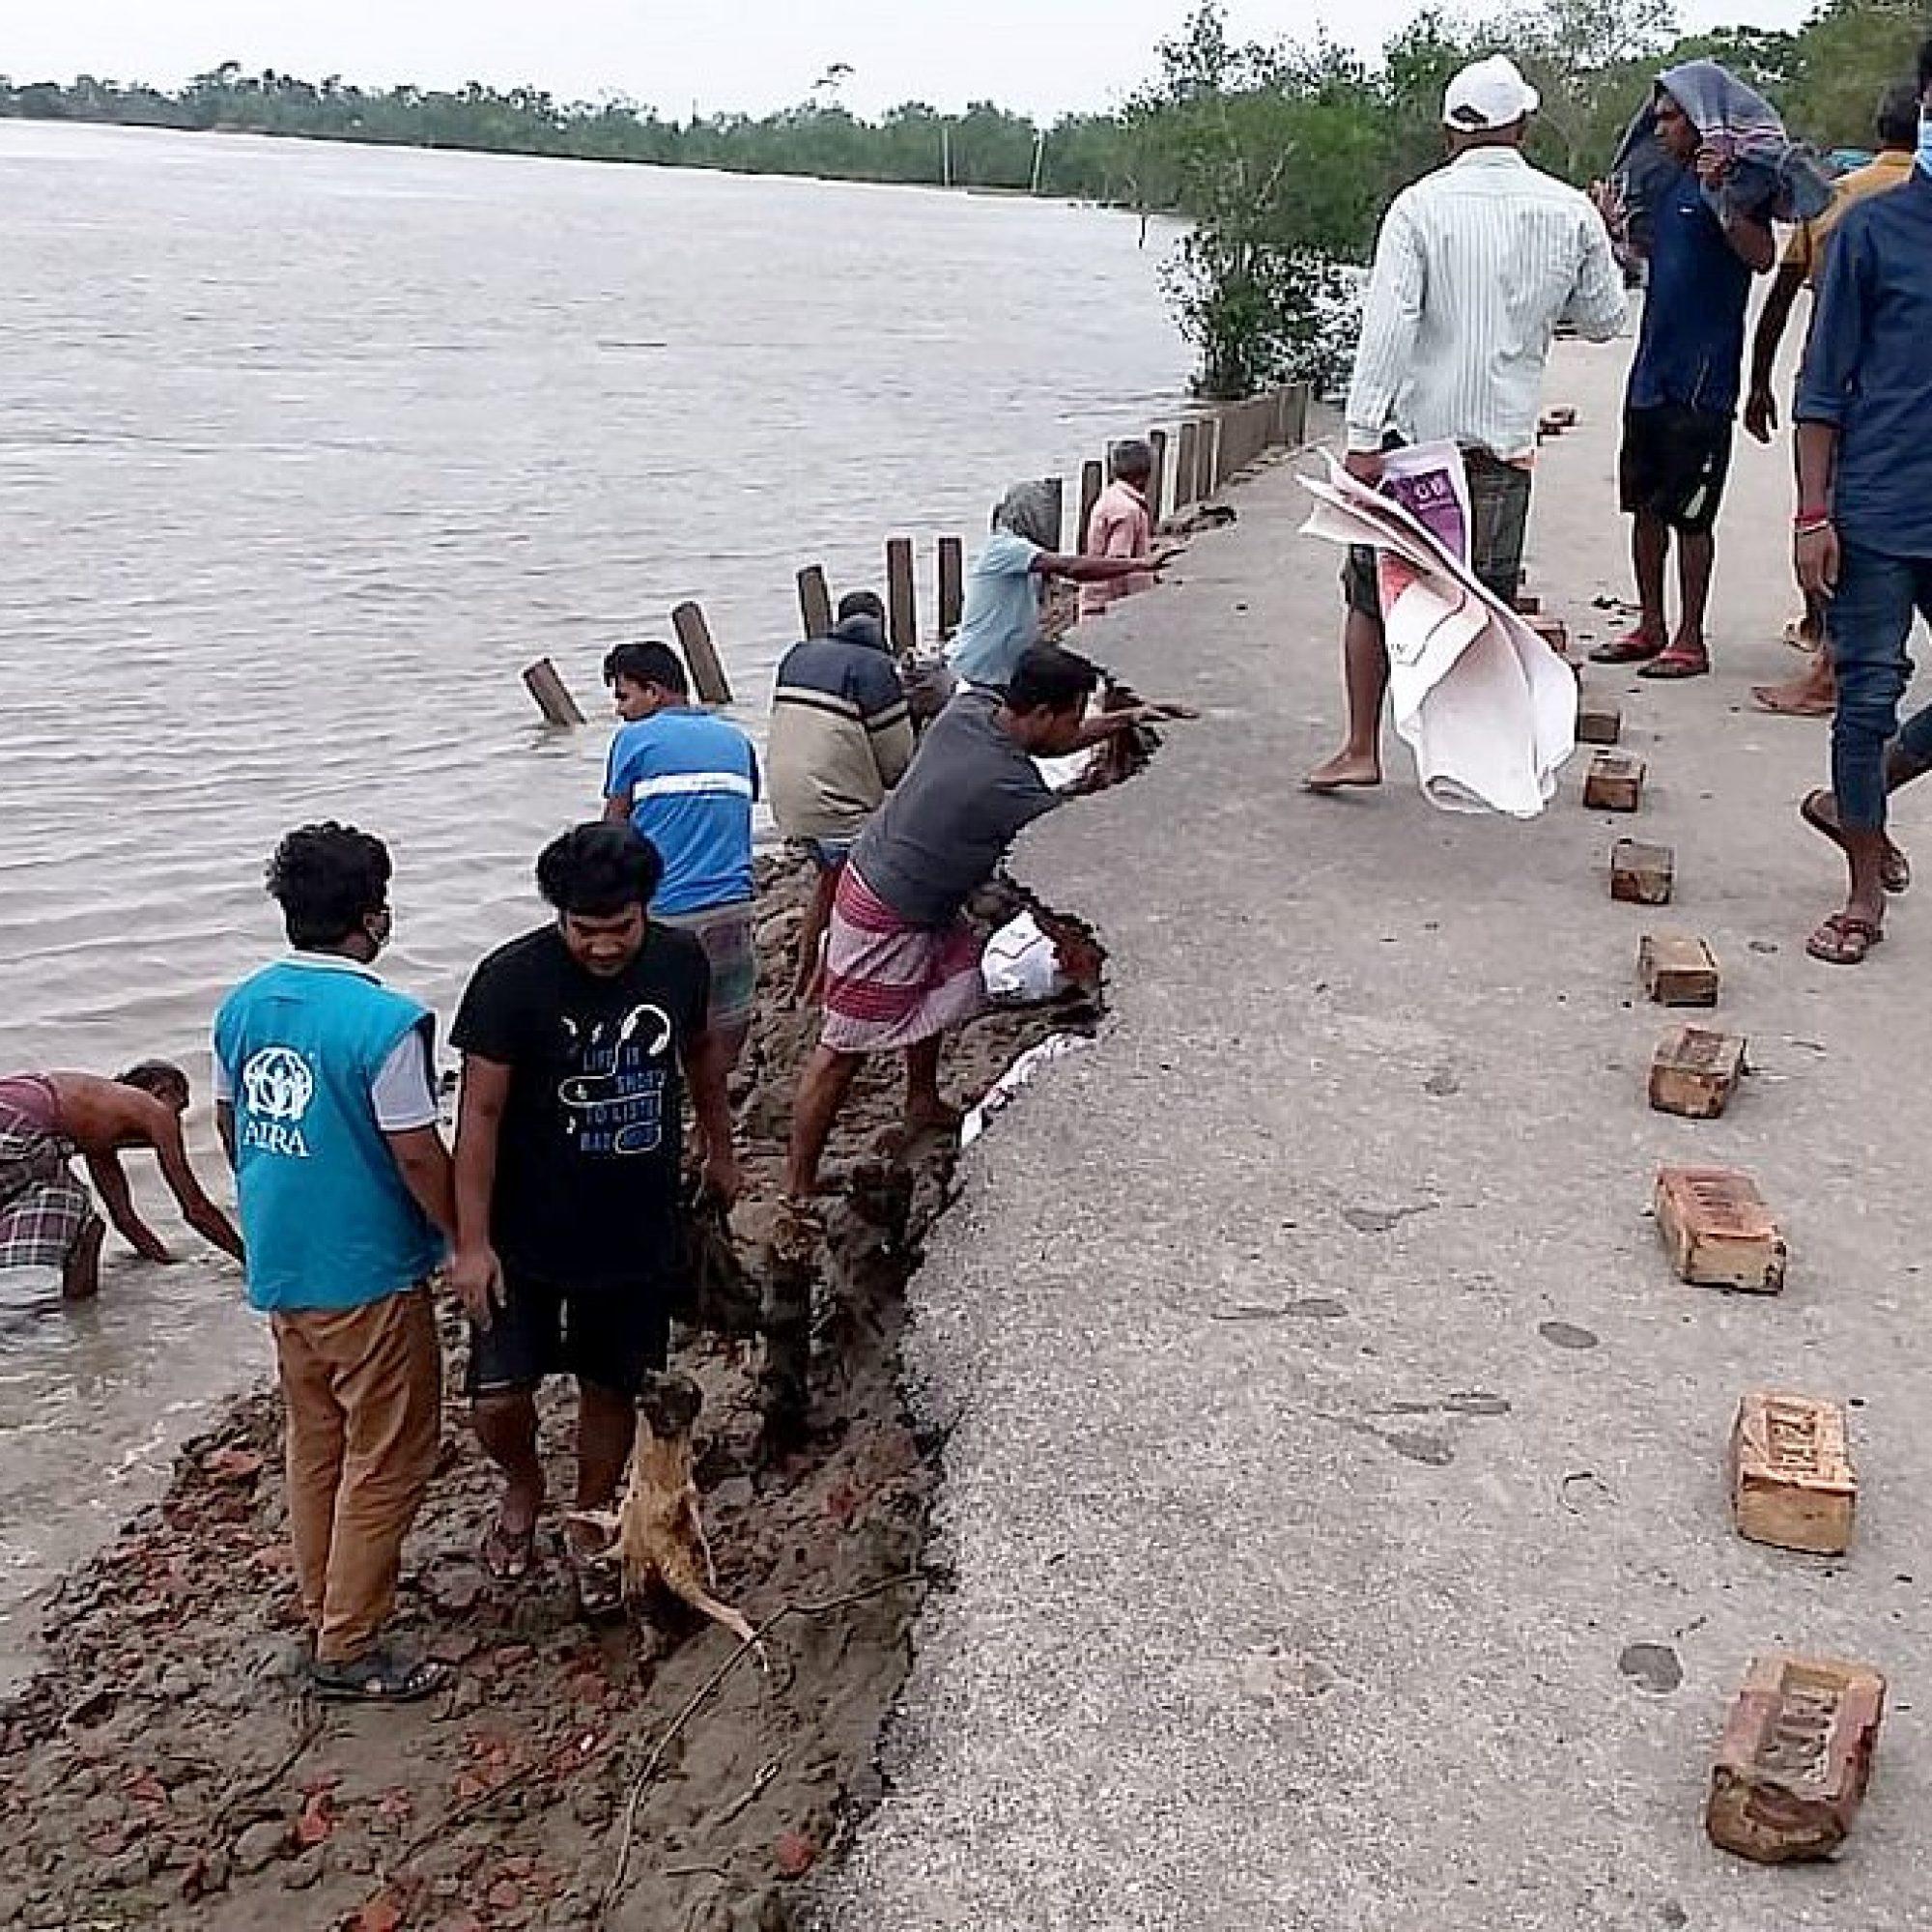 csm_ADRA_6_ADRA_responds_after_Cyclone_Amphan_wreaks_havoc_in_BangladeshCroppedforPosting_ccfe32fd4c